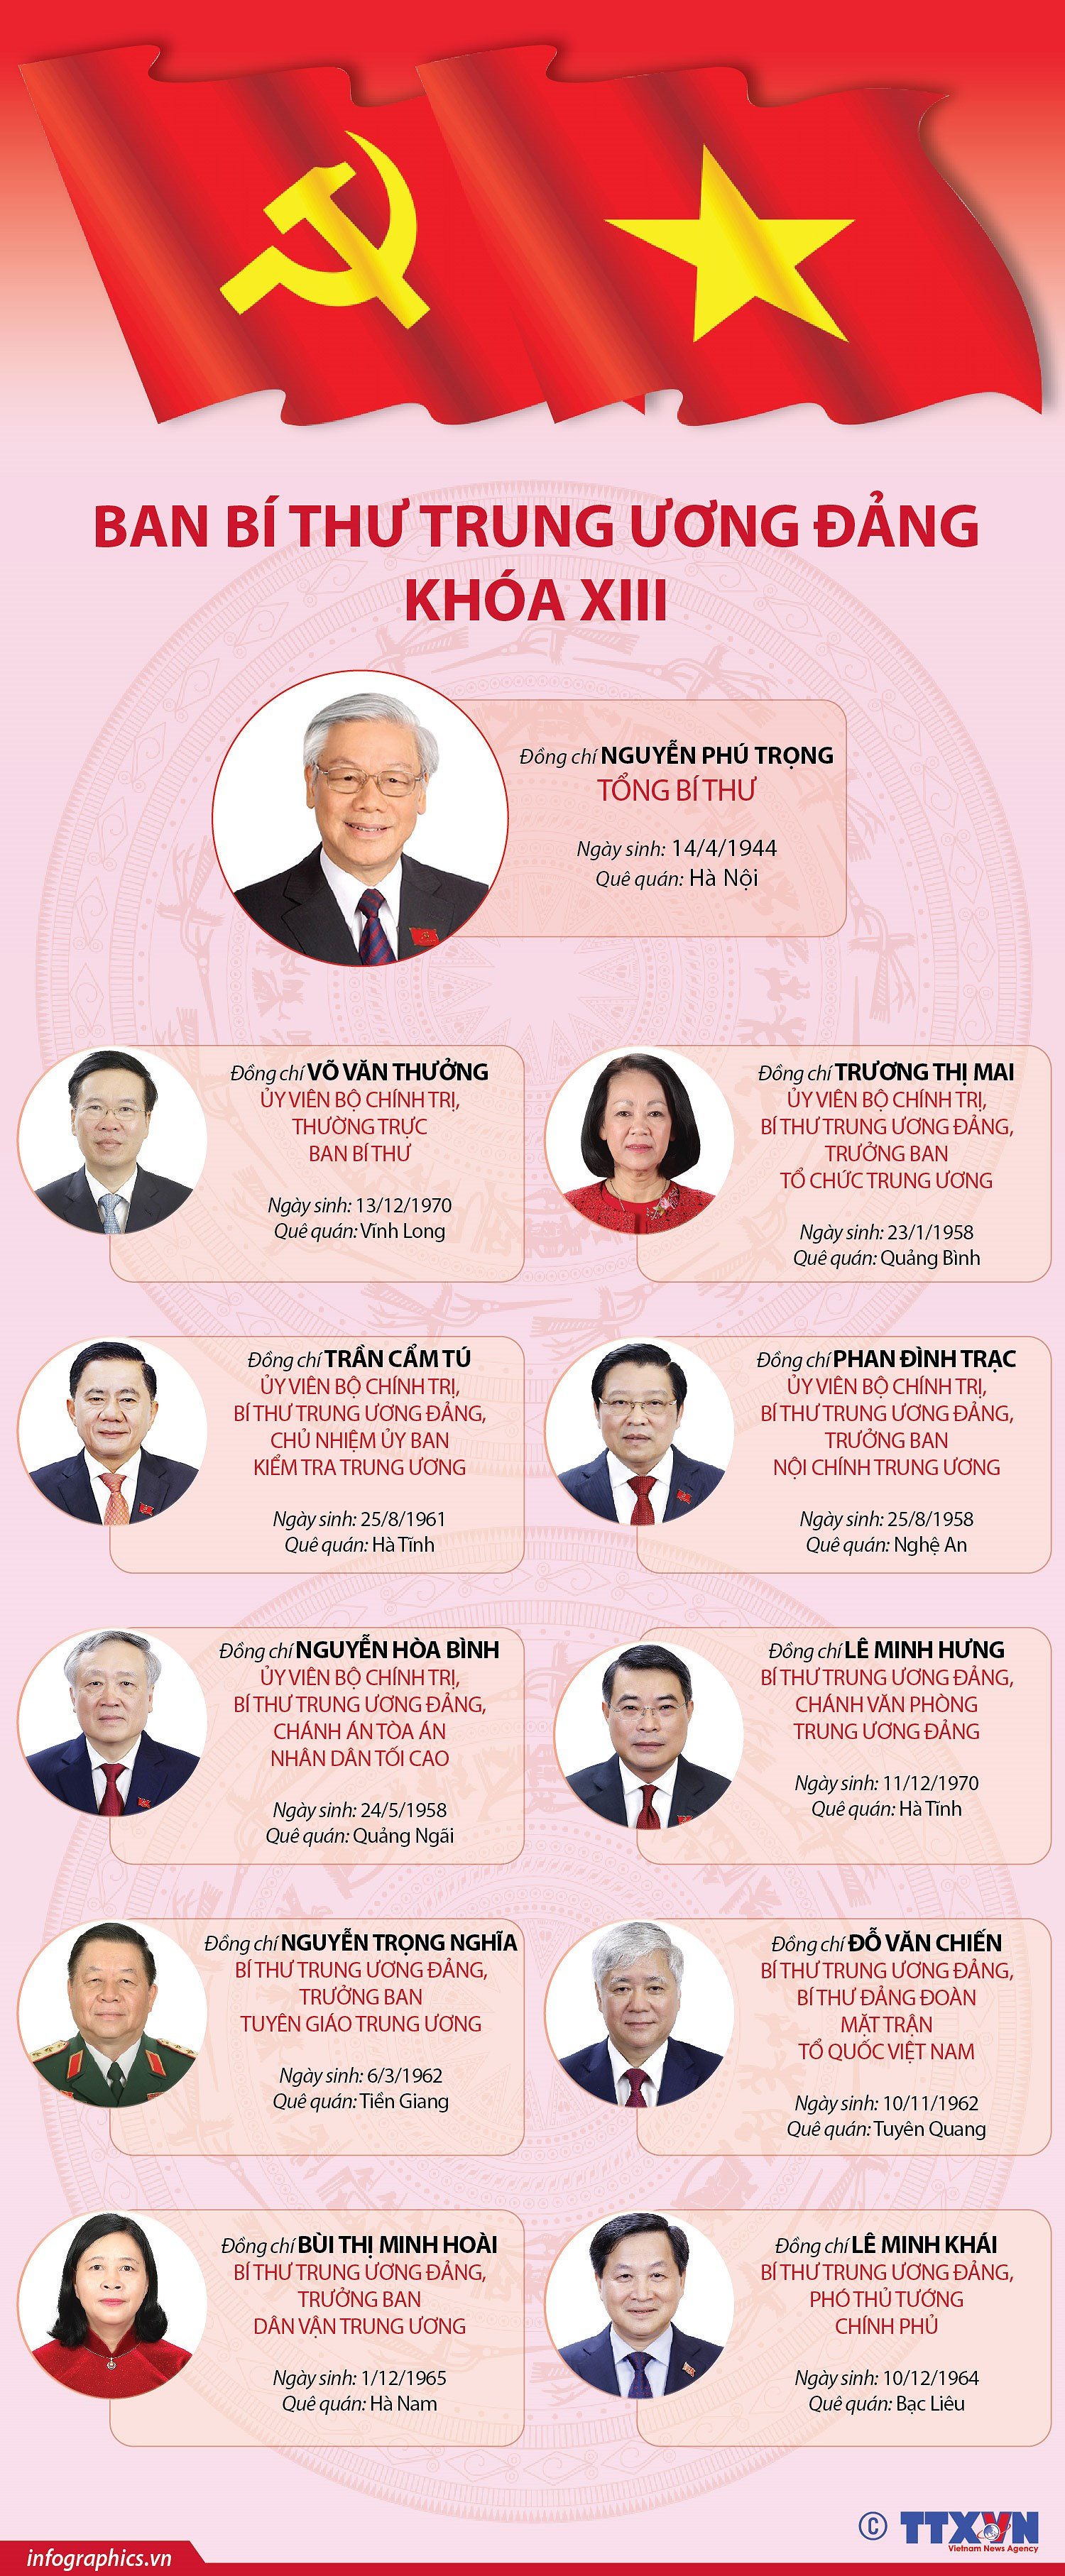 [Infographics] Danh sach Ban Bi thu Trung uong Dang khoa XIII hinh anh 1